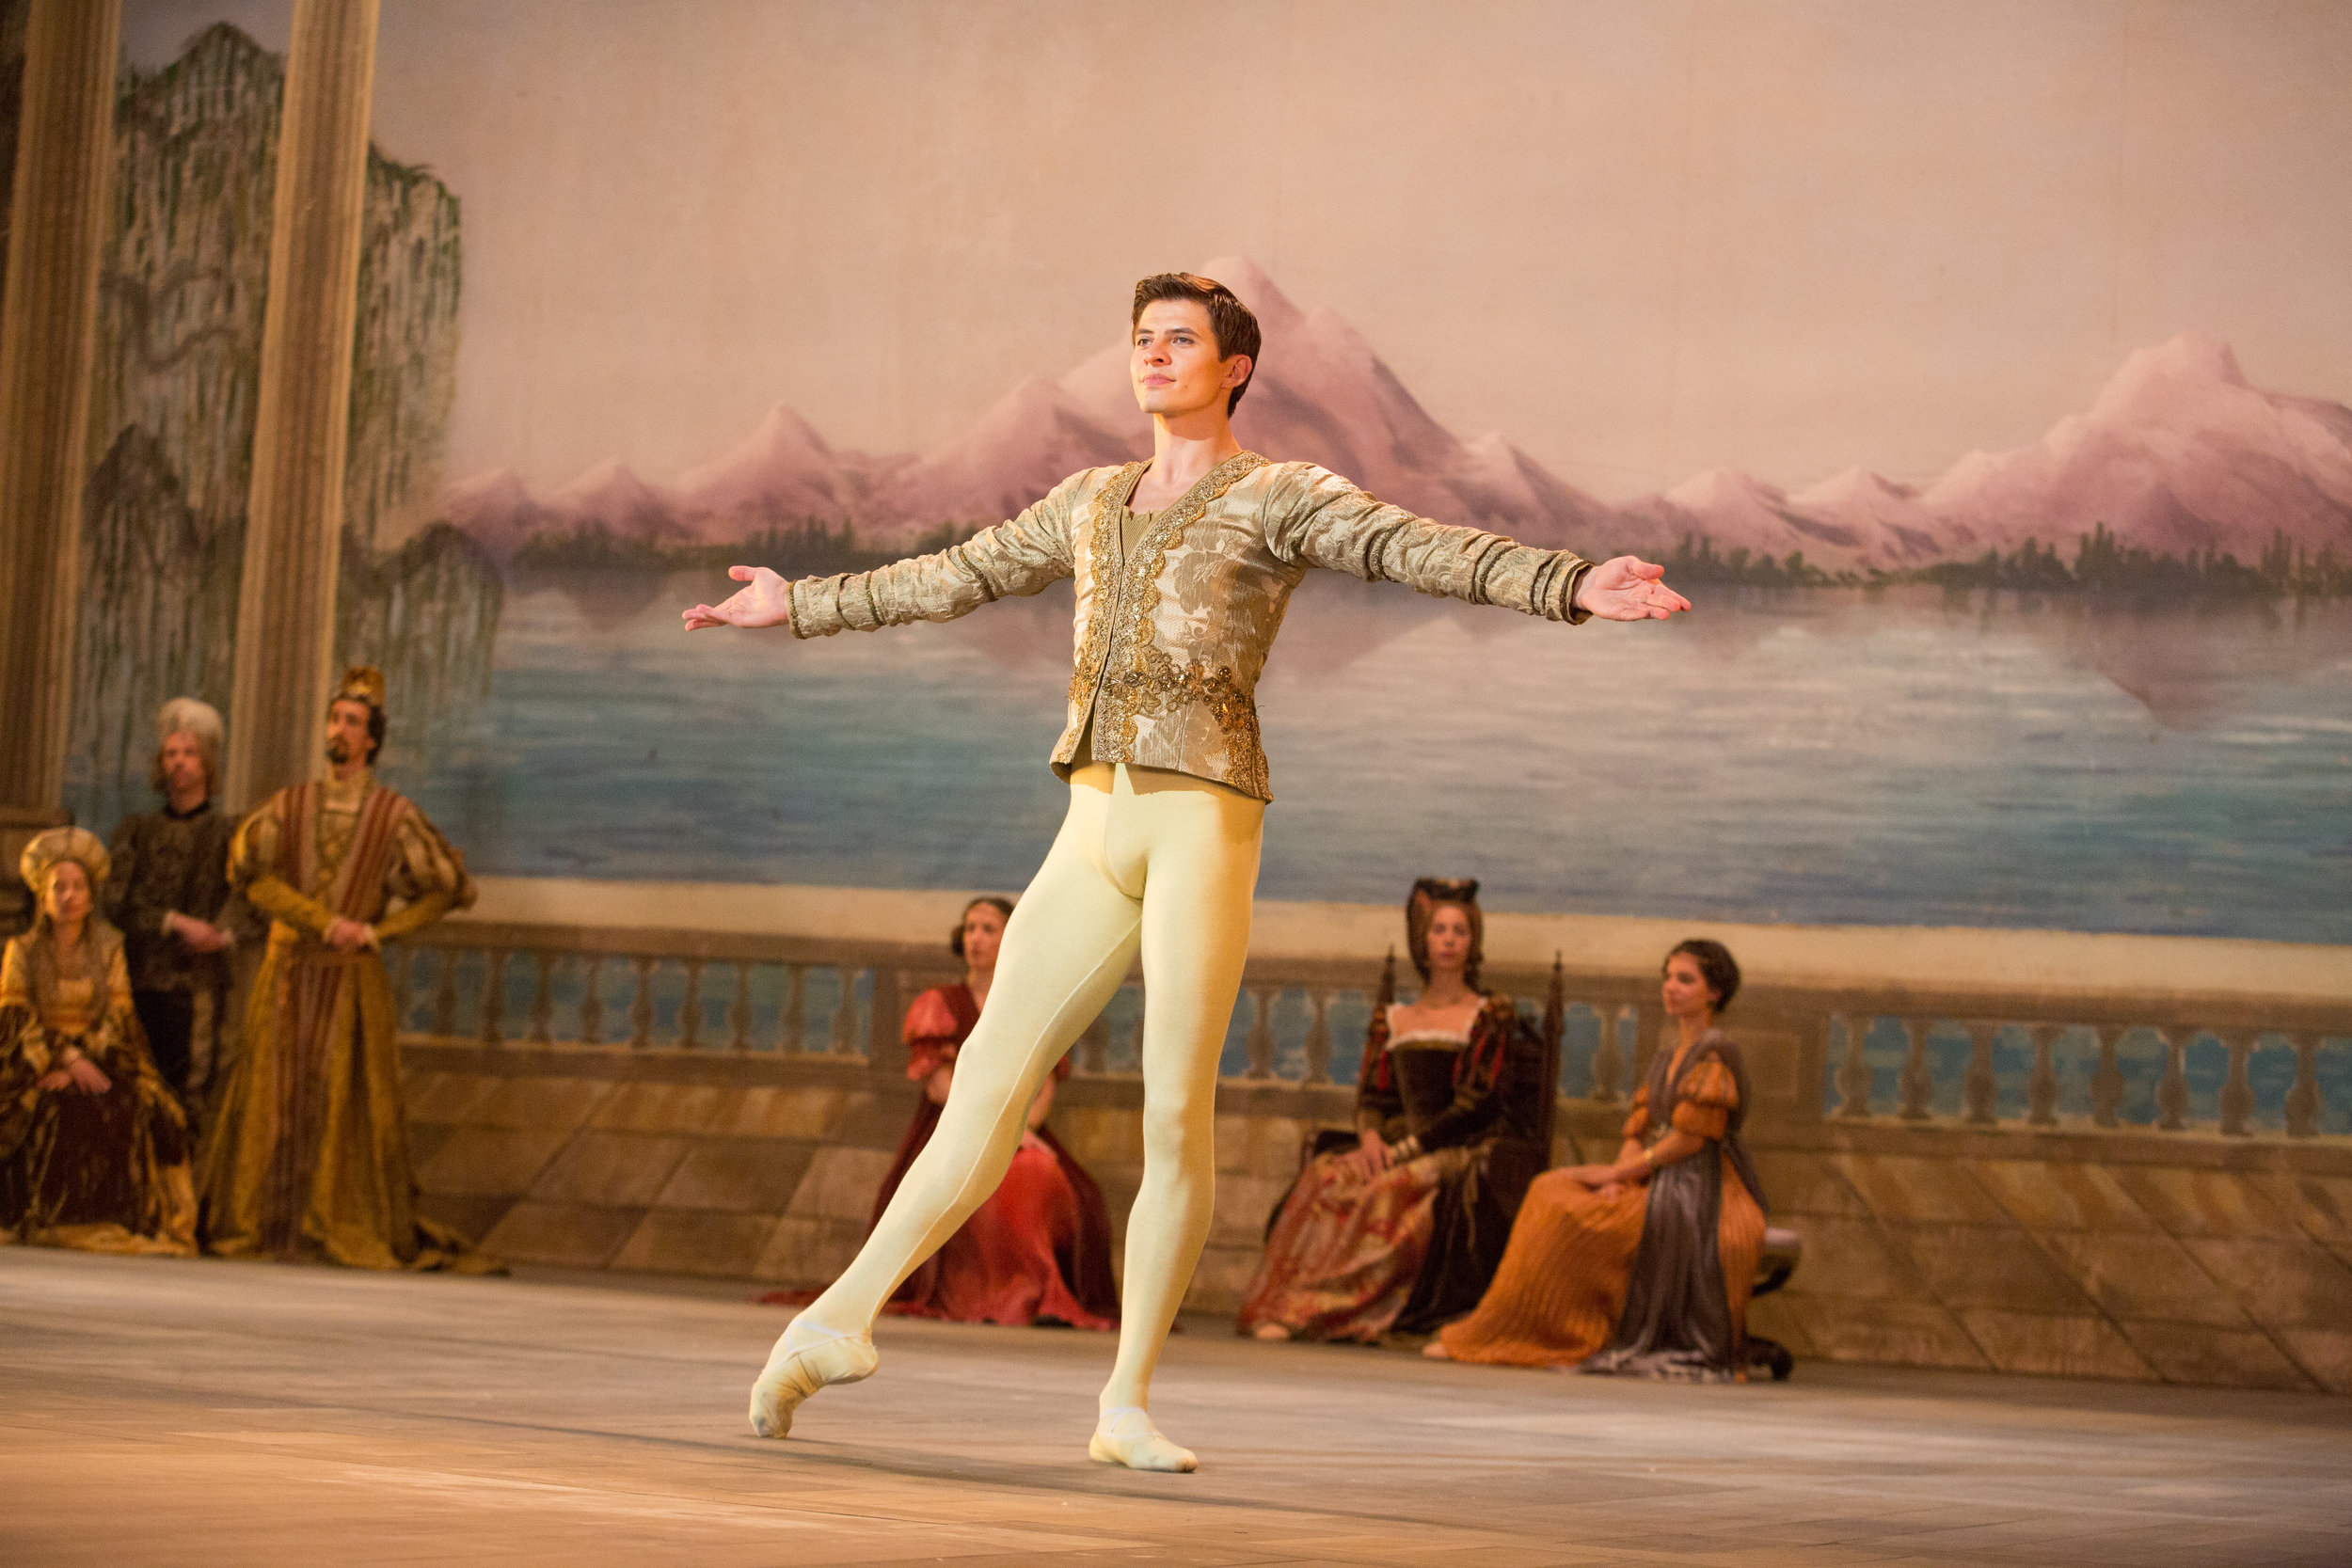 Ukrainian ballet star Oleg Ivenko portrays the young Rudolf Nureyev in The White Crow